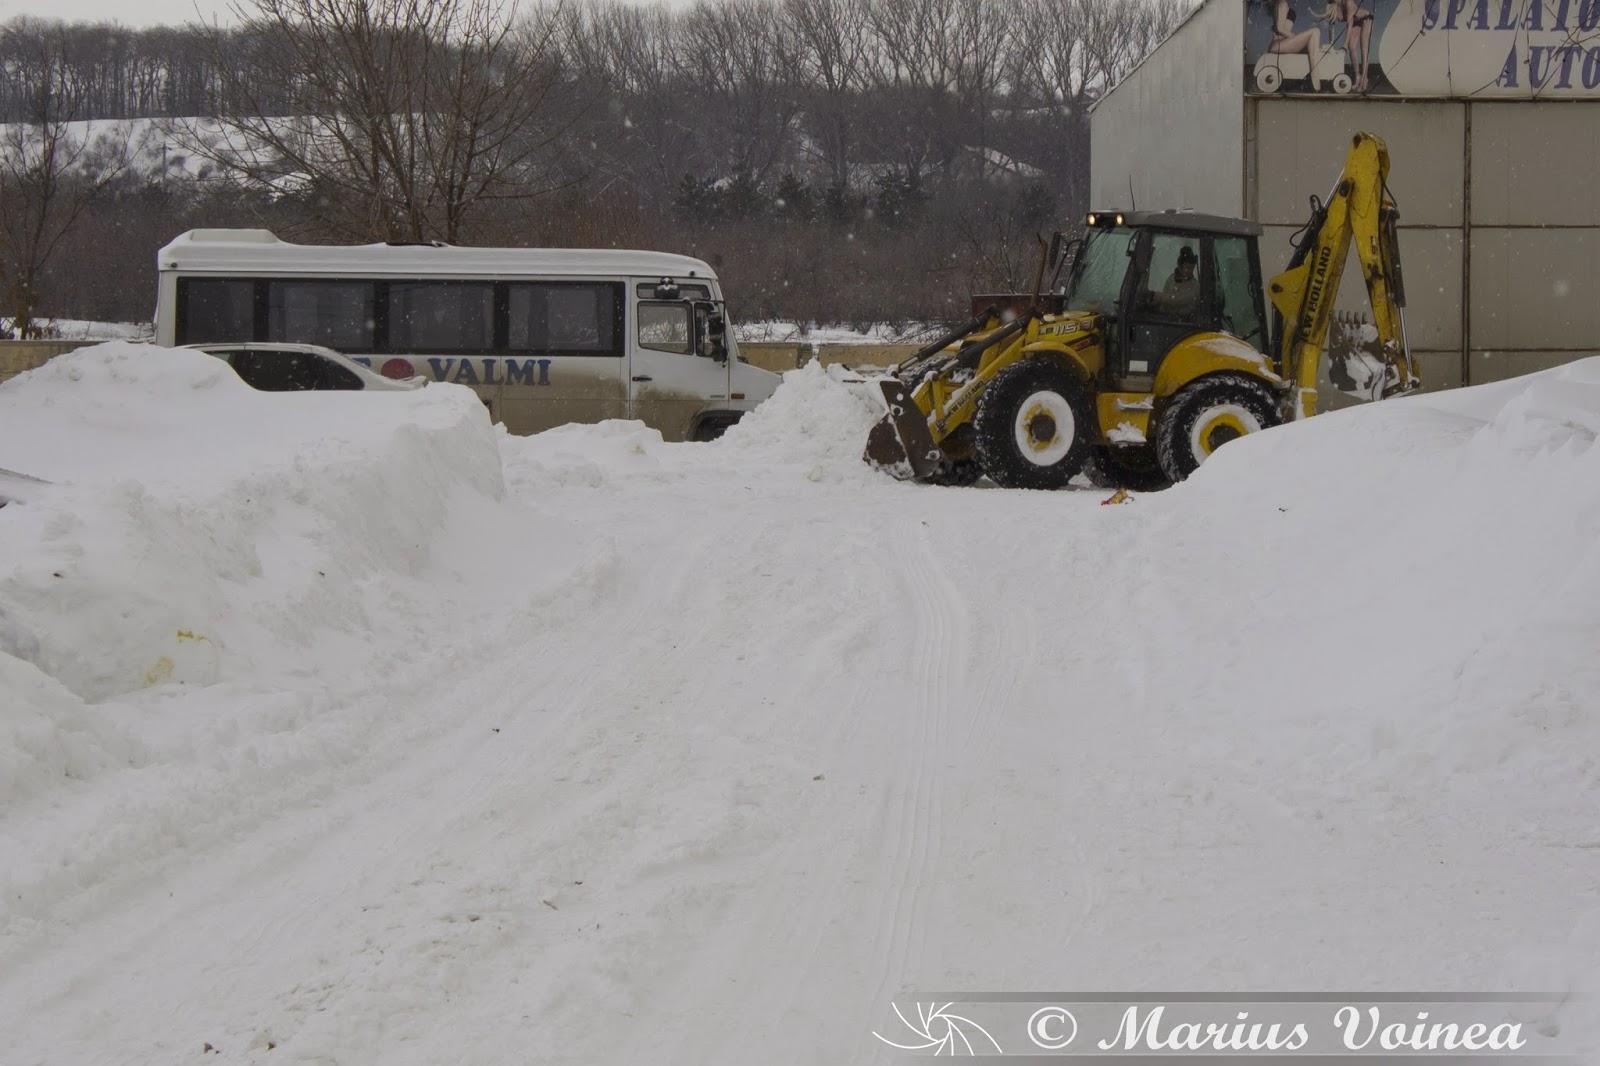 iarna la ramnicu sarat, 2014 foto 15